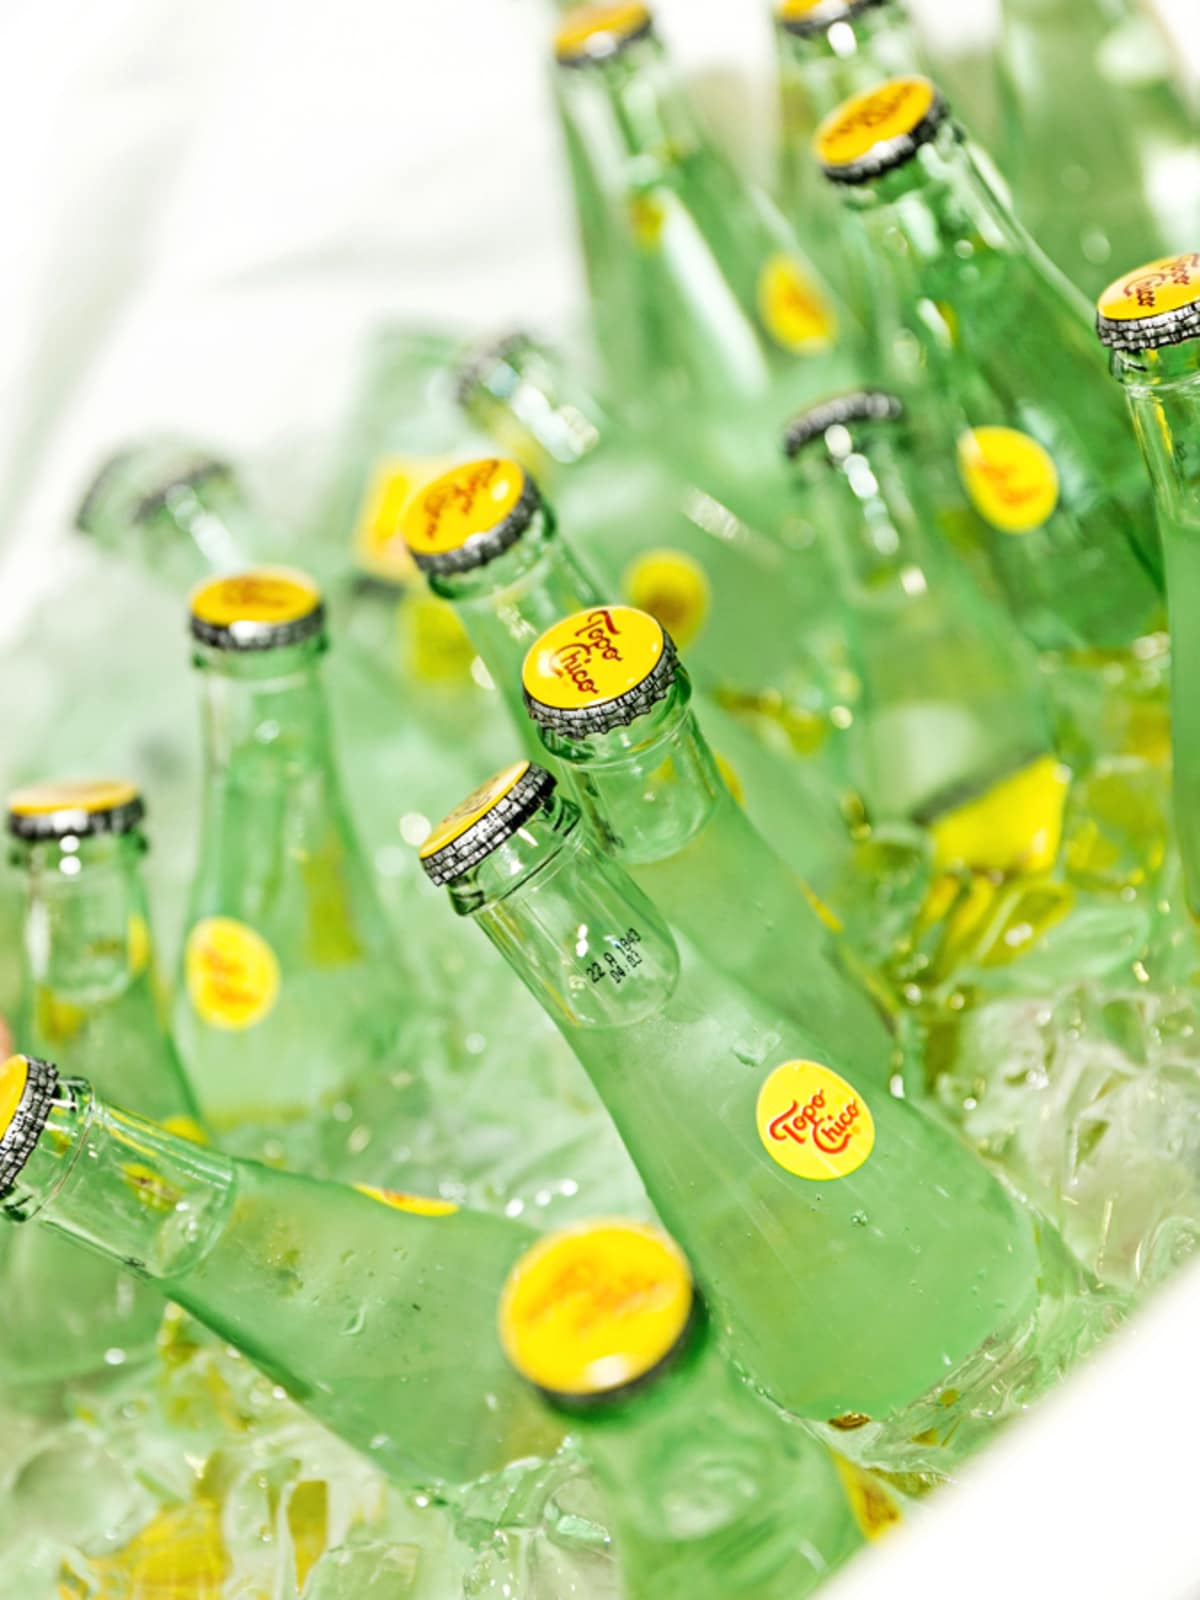 Tastemaker Awards 2018 Topo Chico bottles hydration station